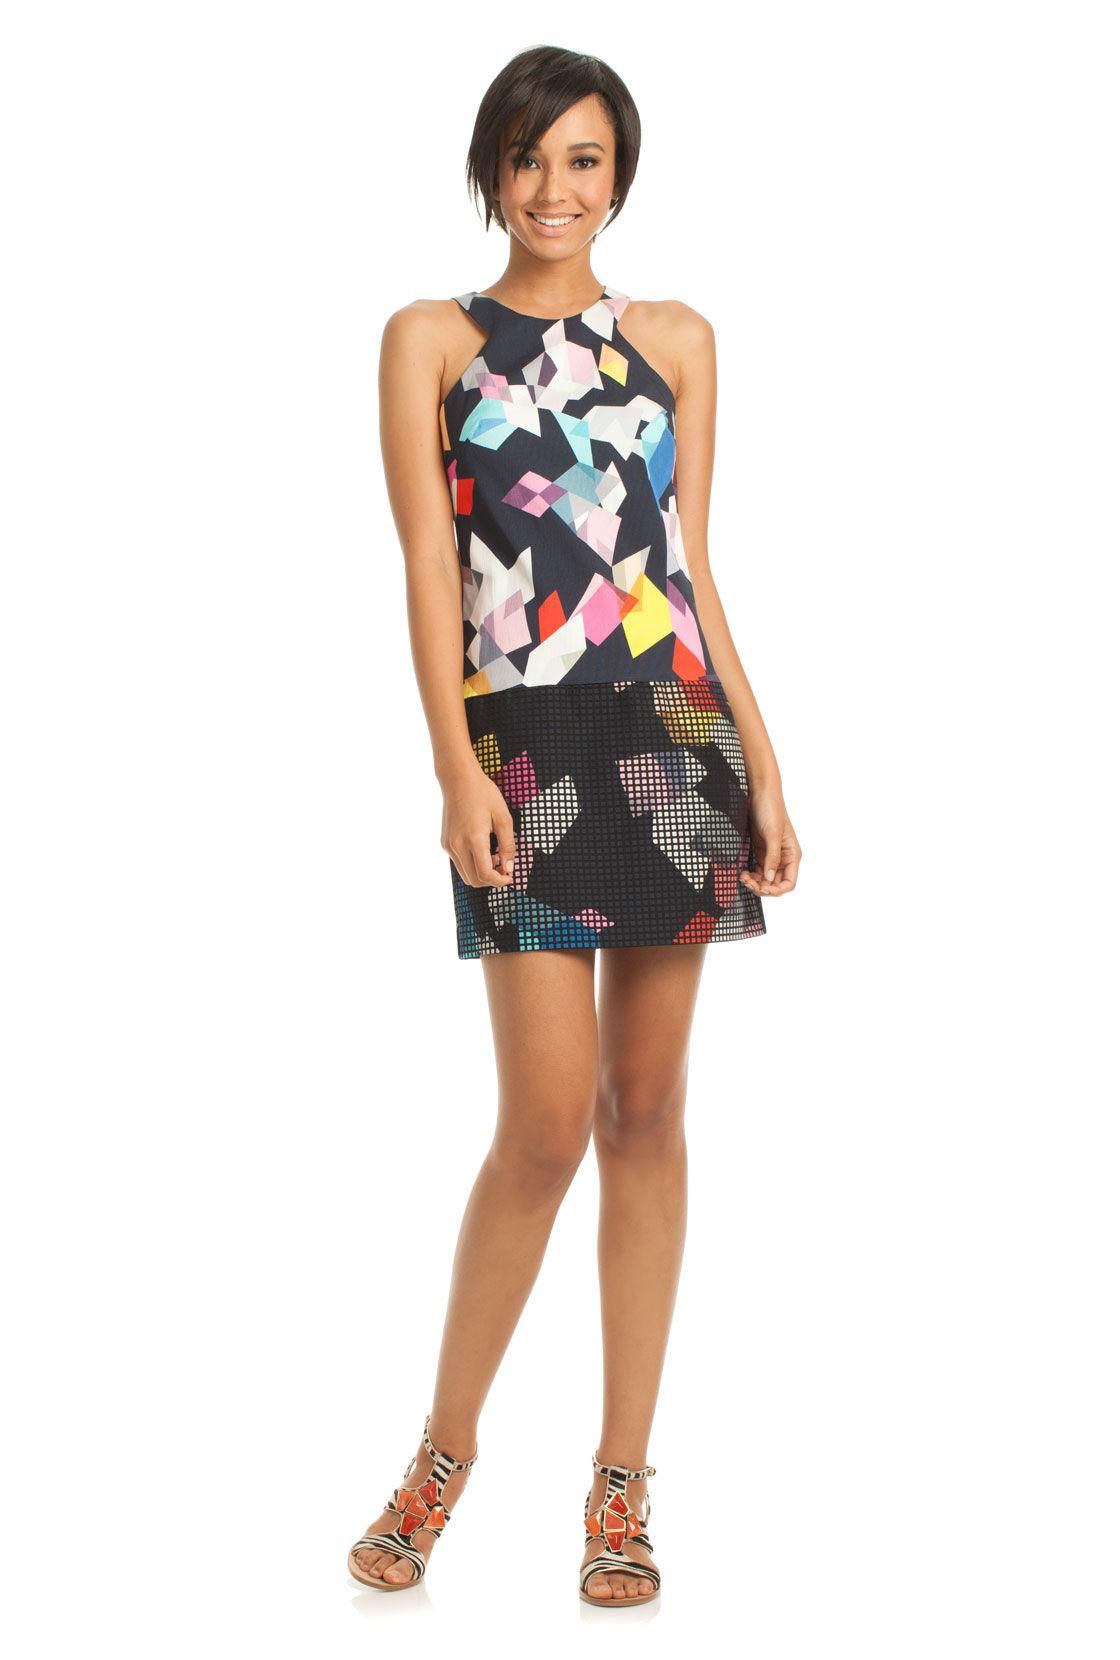 aa786d7e935 Lyst - Trina Turk Aptos Dress